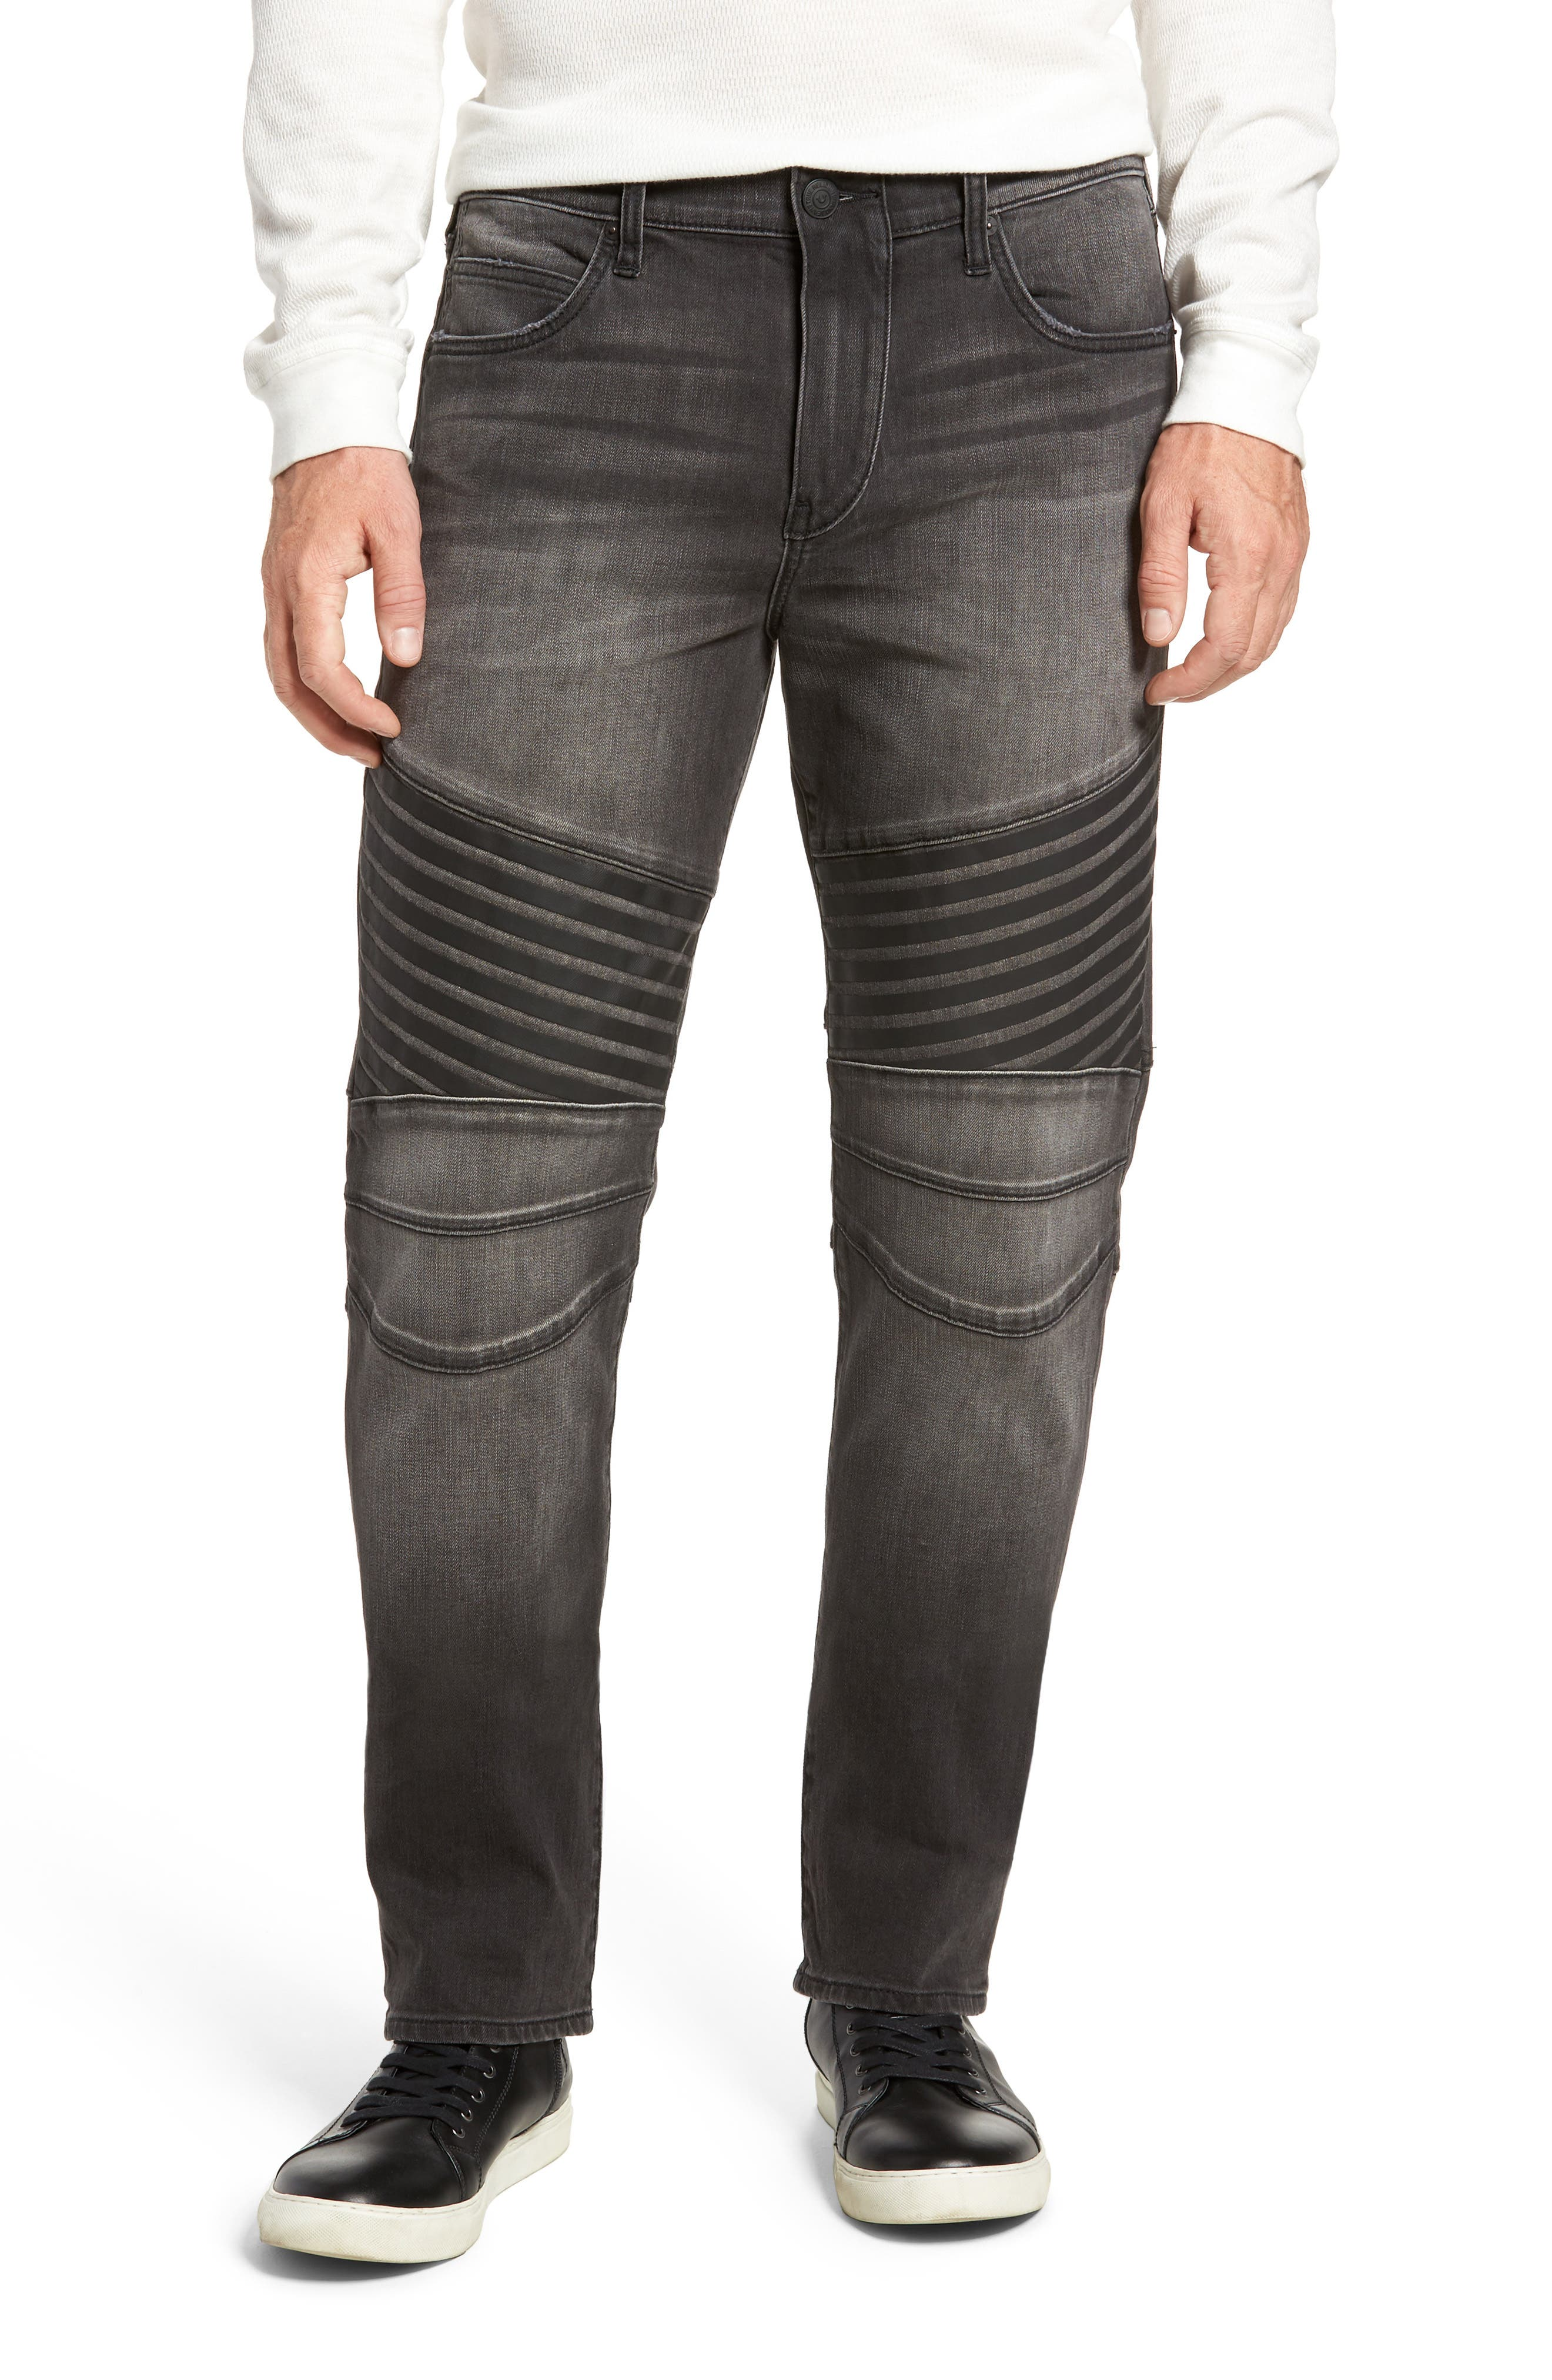 True Religion Brand Jeans Geno Straight Leg Jeans (Dark Rebel Race)